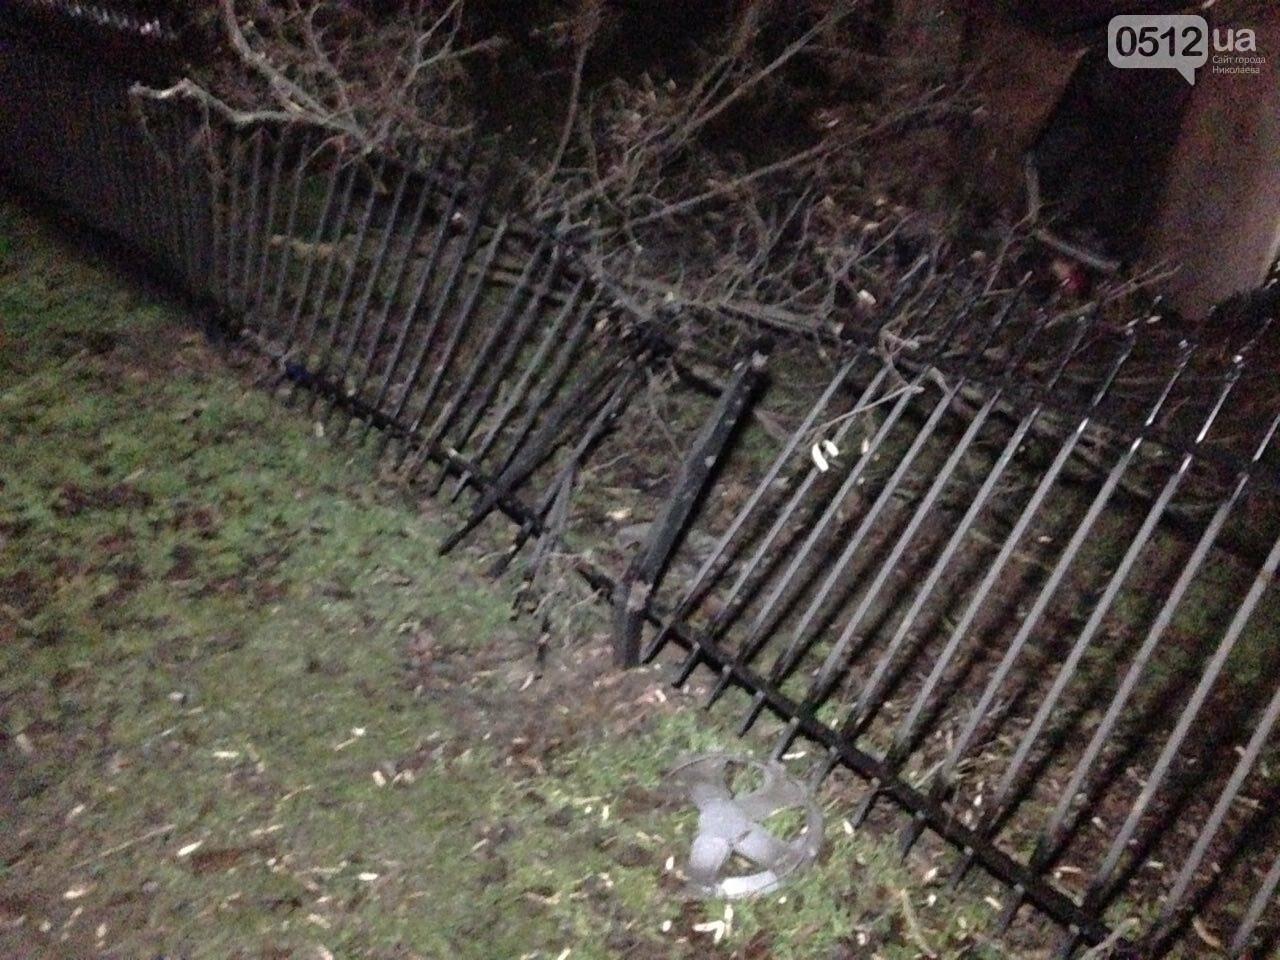 Страшное ДТП в Николаеве: 2 парня и 2 девушки на Мазде влетели в дерево - водитель умер на месте аварии, - ФОТО, фото-5